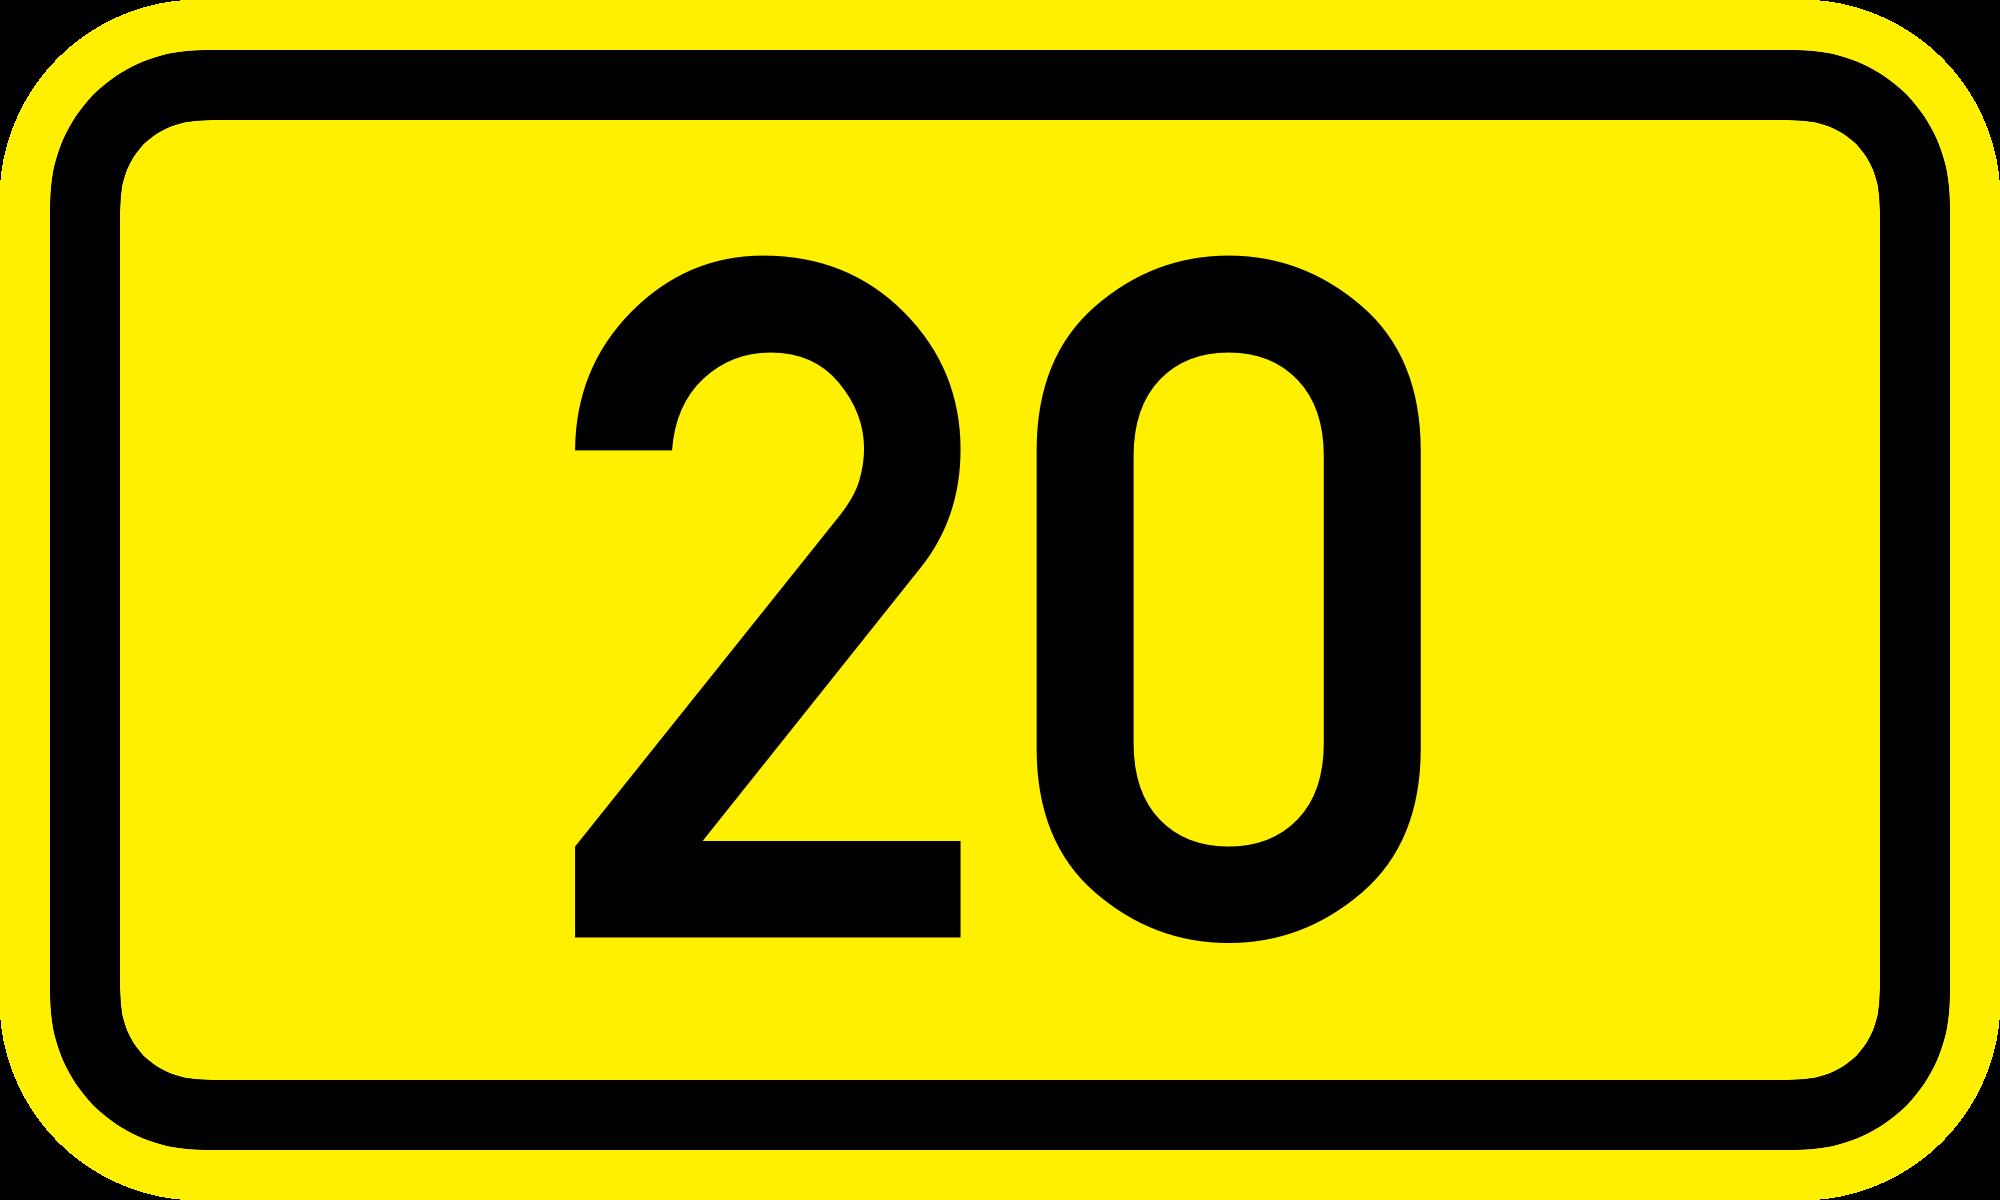 20 - Dr. Odd